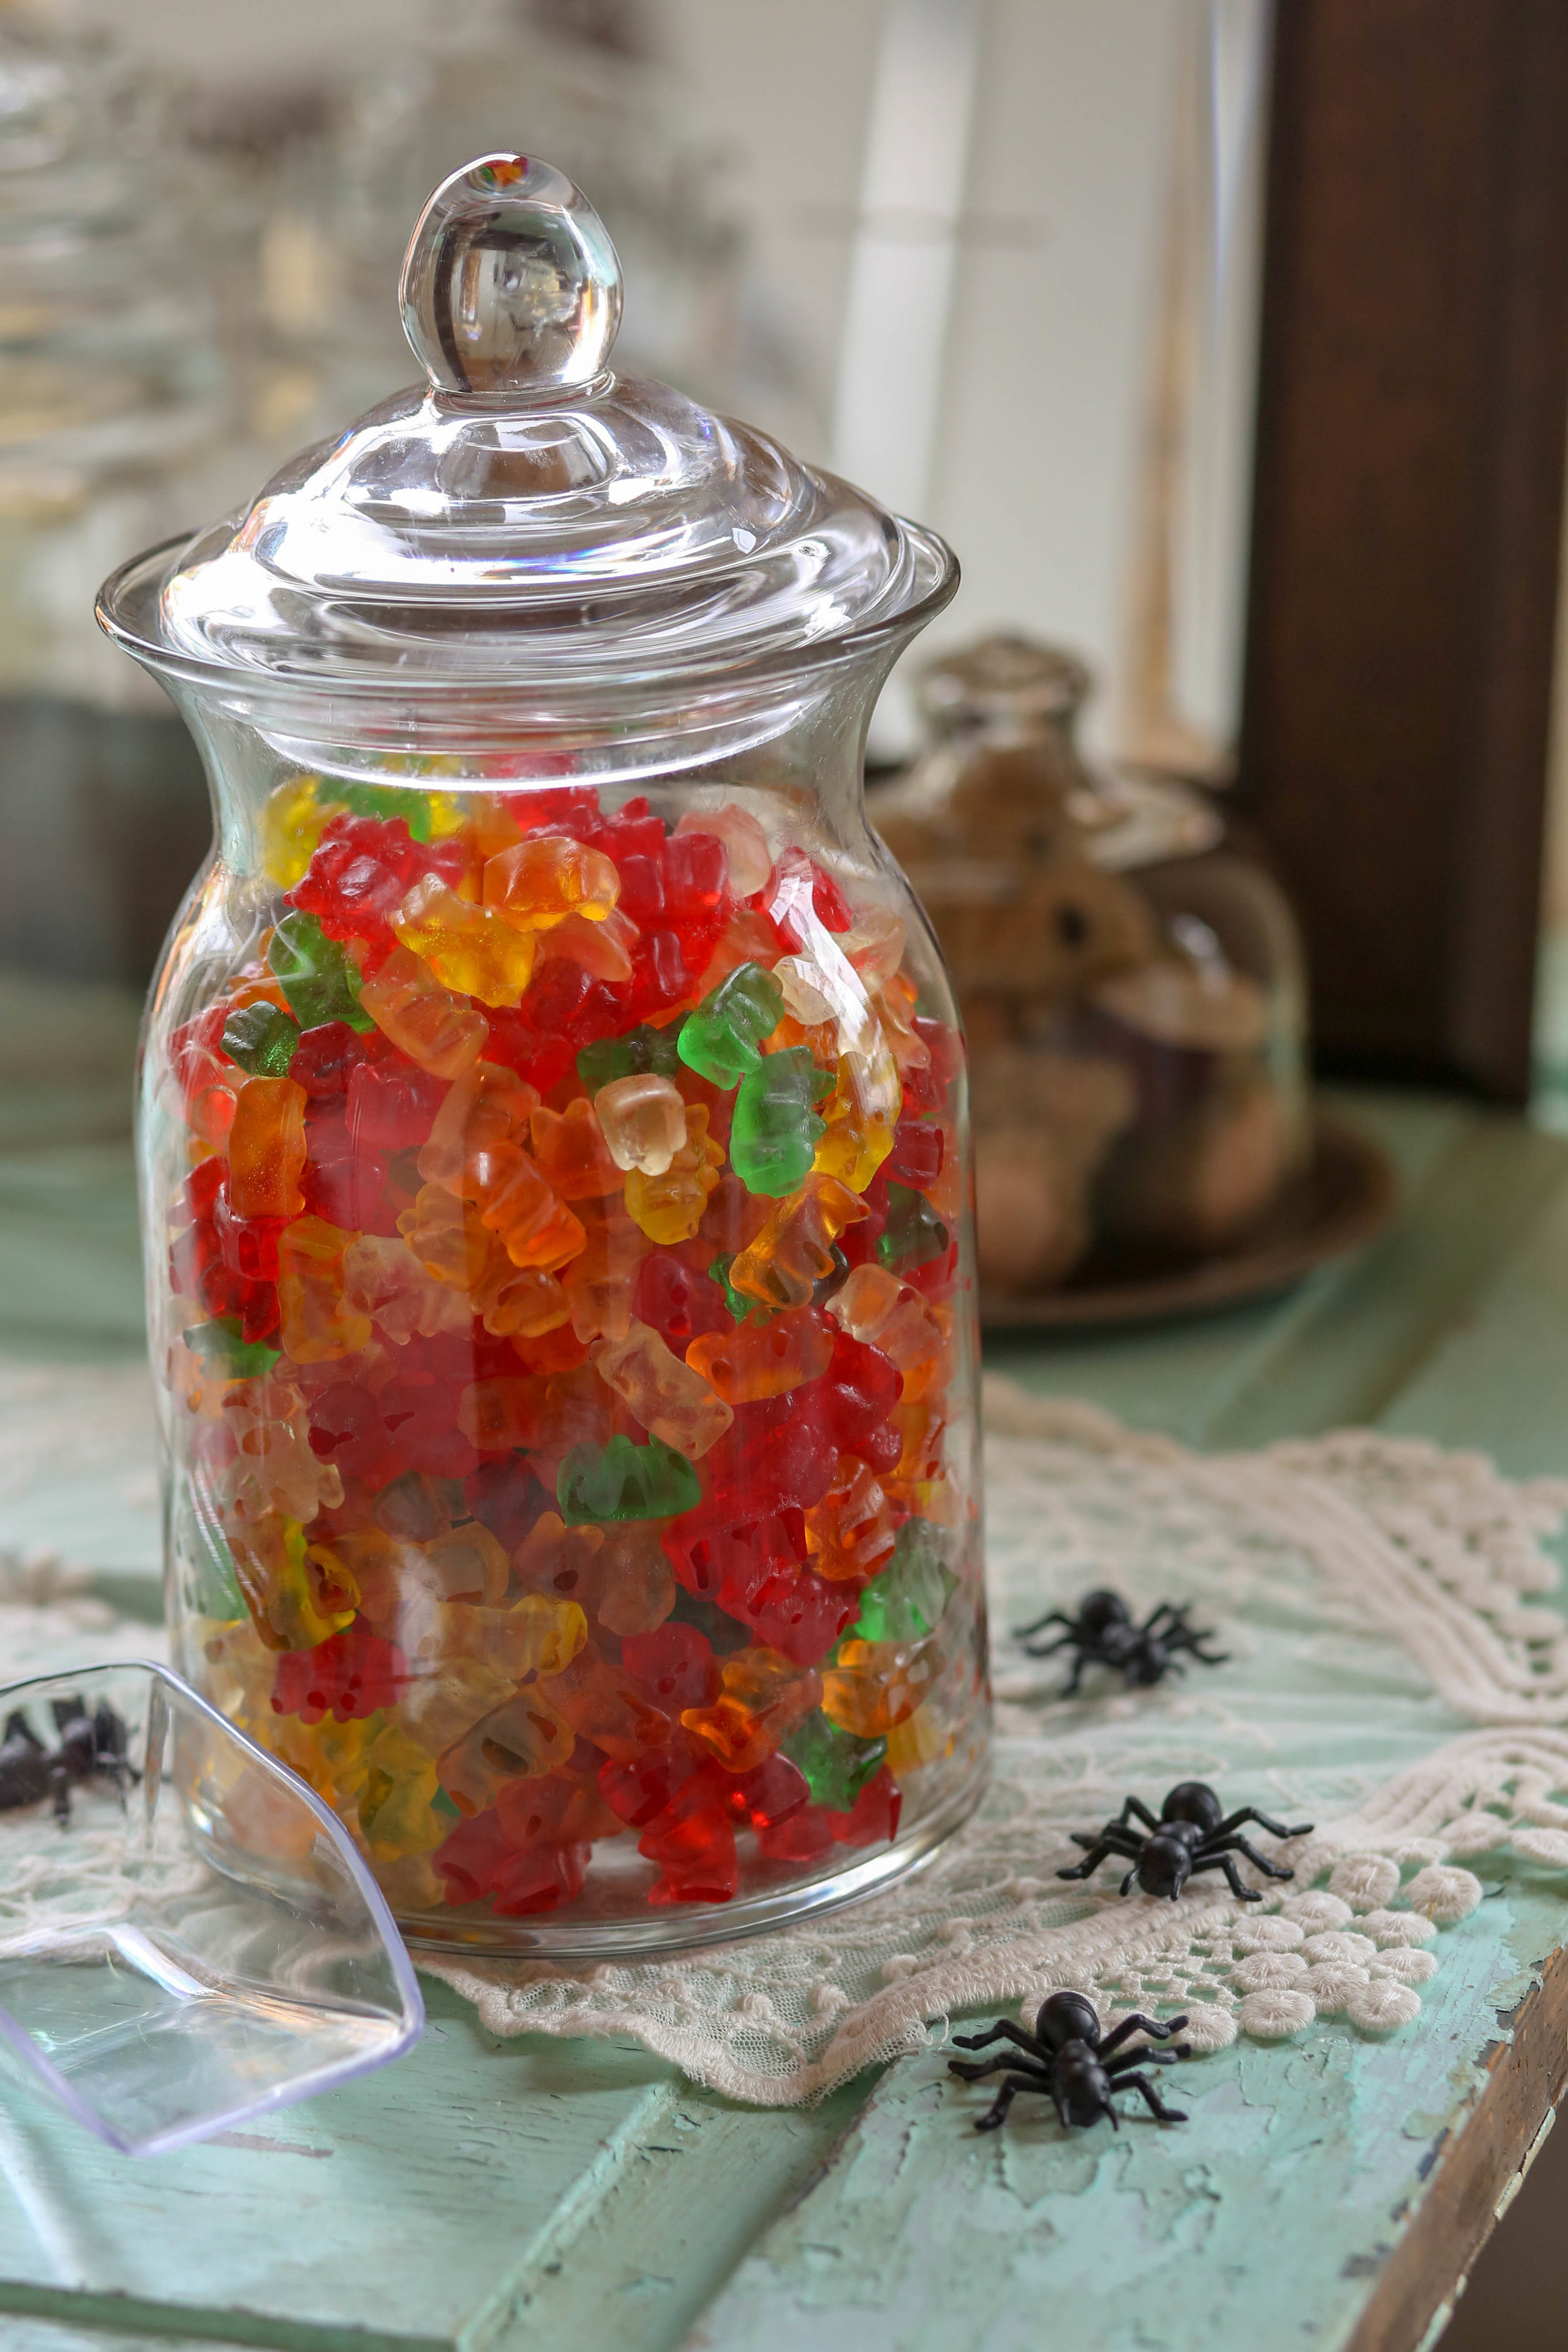 Candy bar jars available